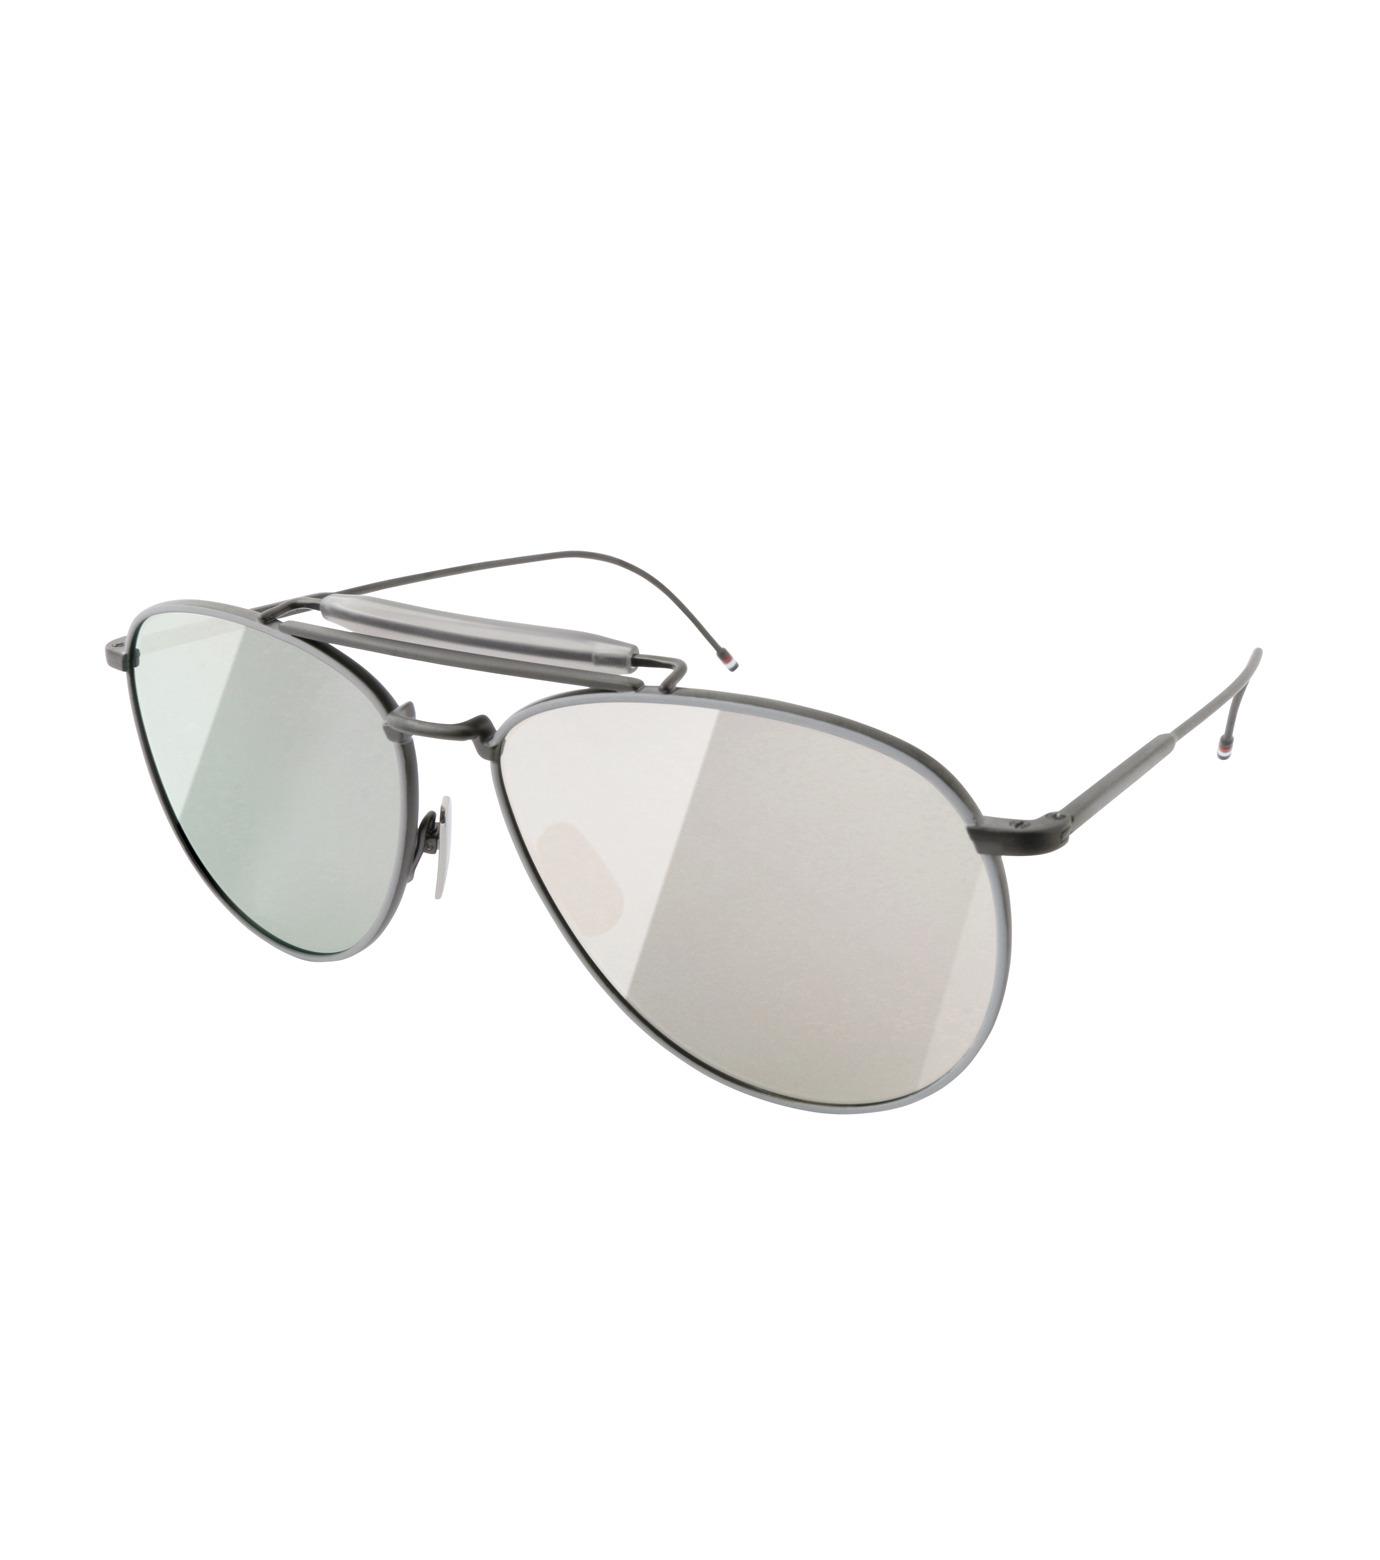 Thom Browne Eye Wear(トム・ブラウン・アイウェア)のTeardrop Silver-BLACK(アイウェア/eyewear)-TB-015-LTD-13 拡大詳細画像1